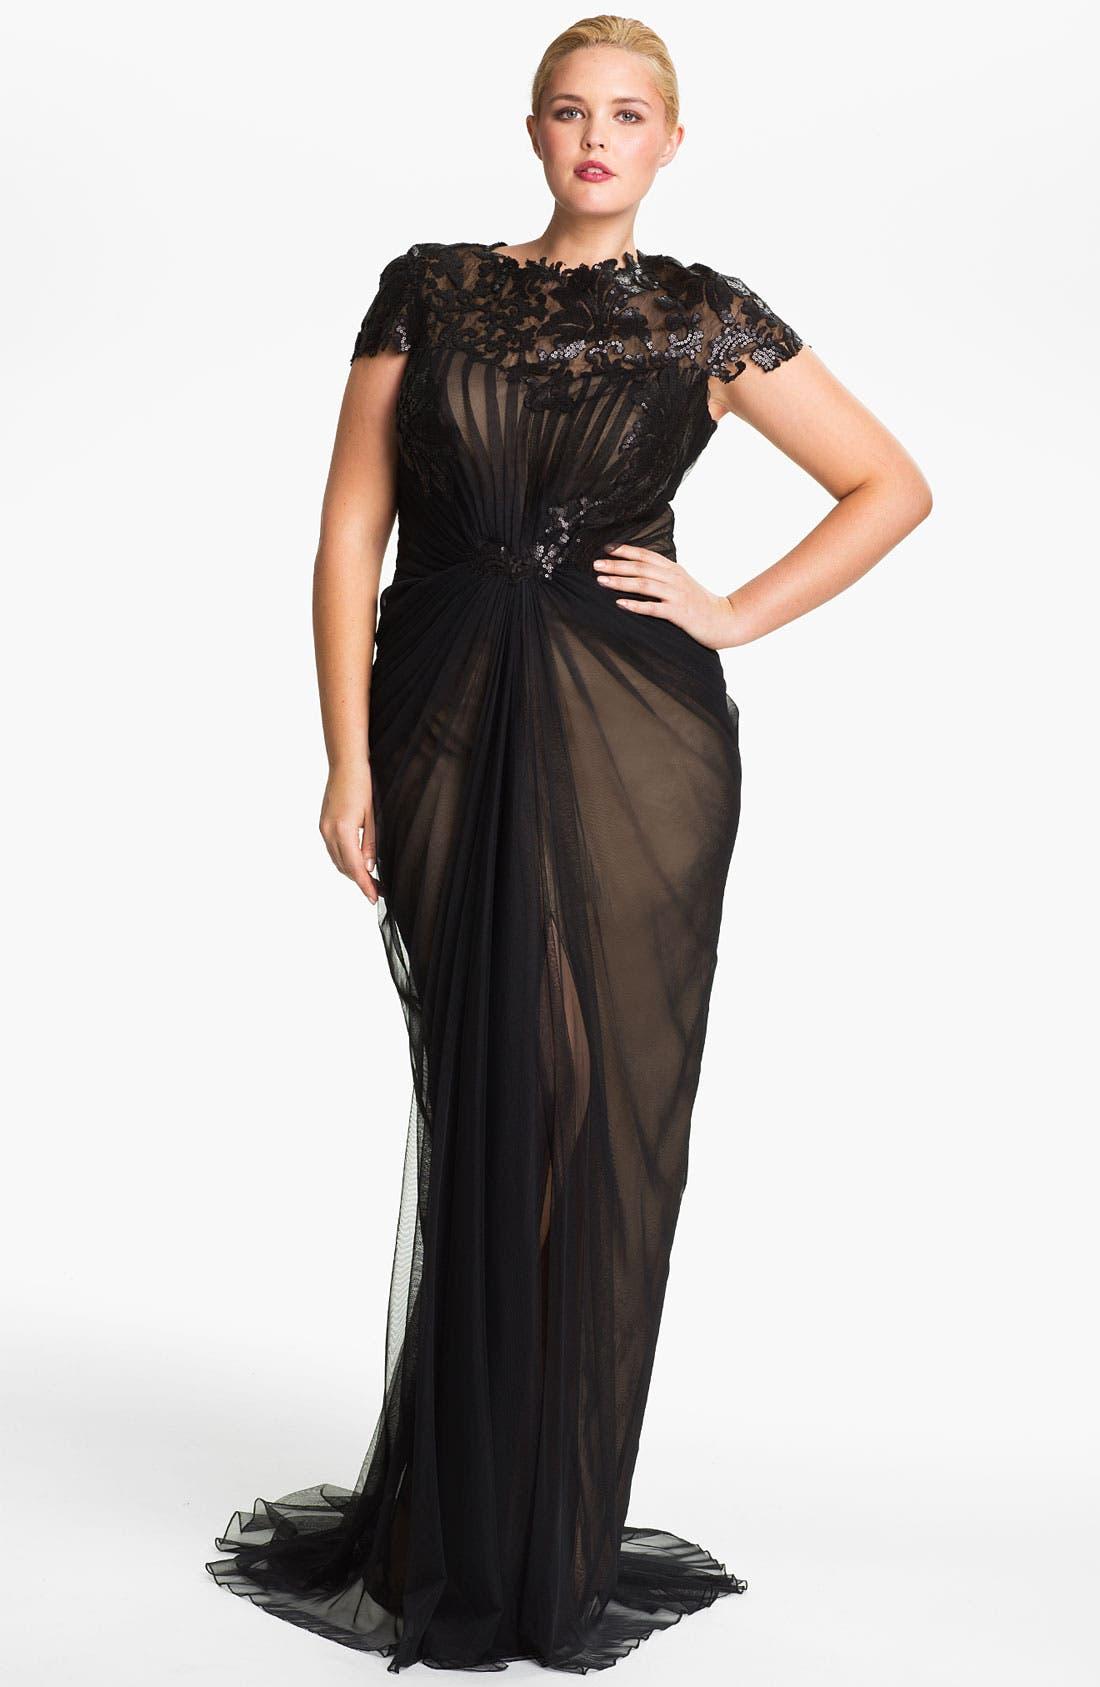 Alternate Image 1 Selected - Tadashi Shoji Chiffon & Lace Gown (Plus Size)